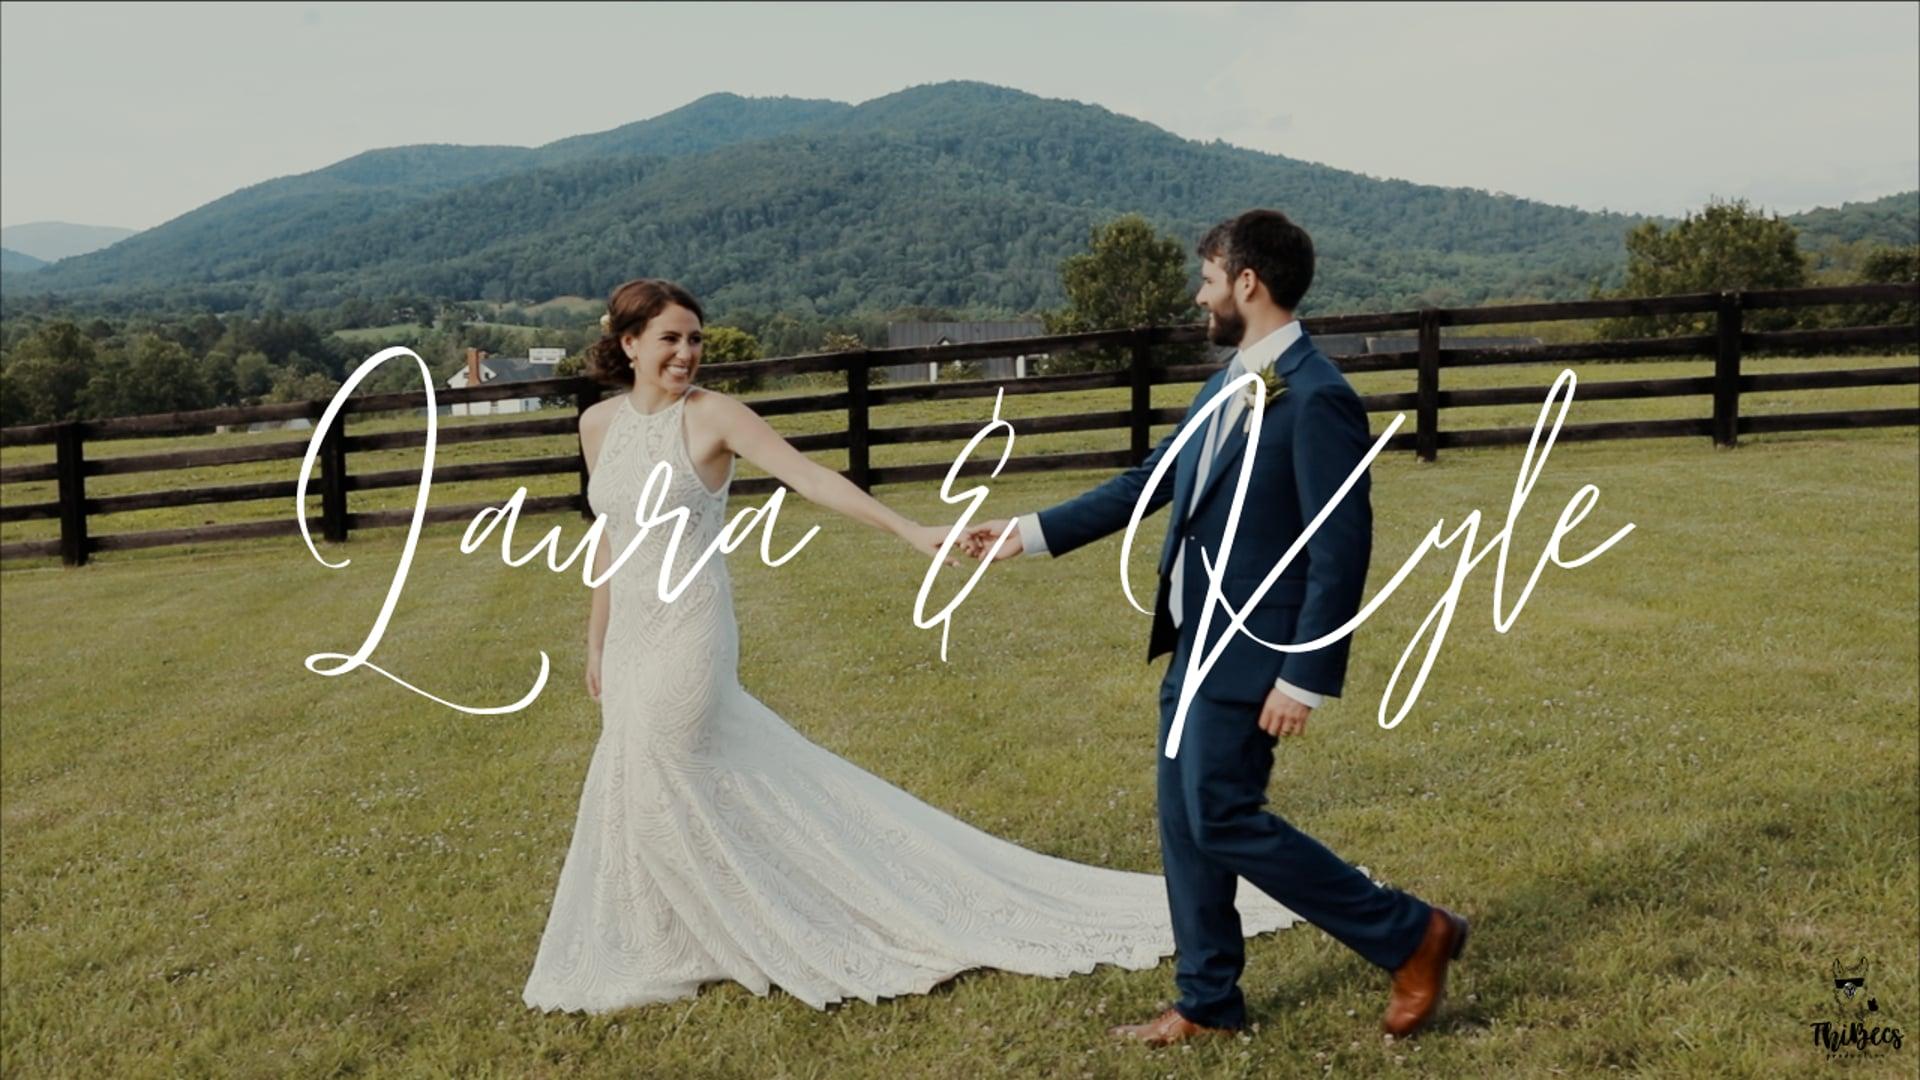 Laura & Kyle | Crozet, VA | Cinematic Highlight Video